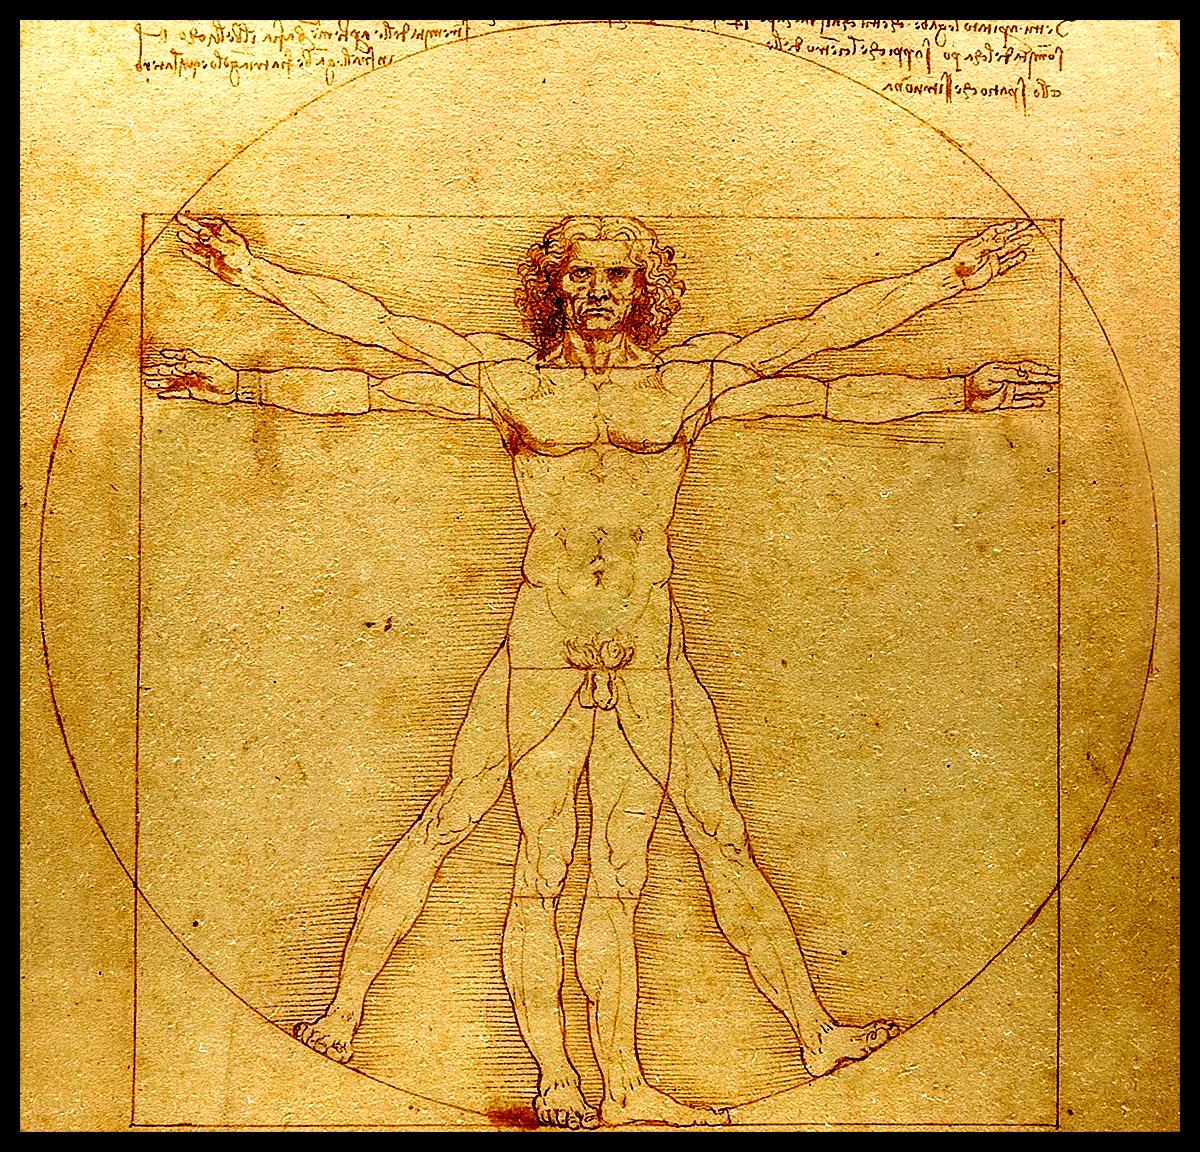 uomo vitruviano - da vinci (1490) d'purb site